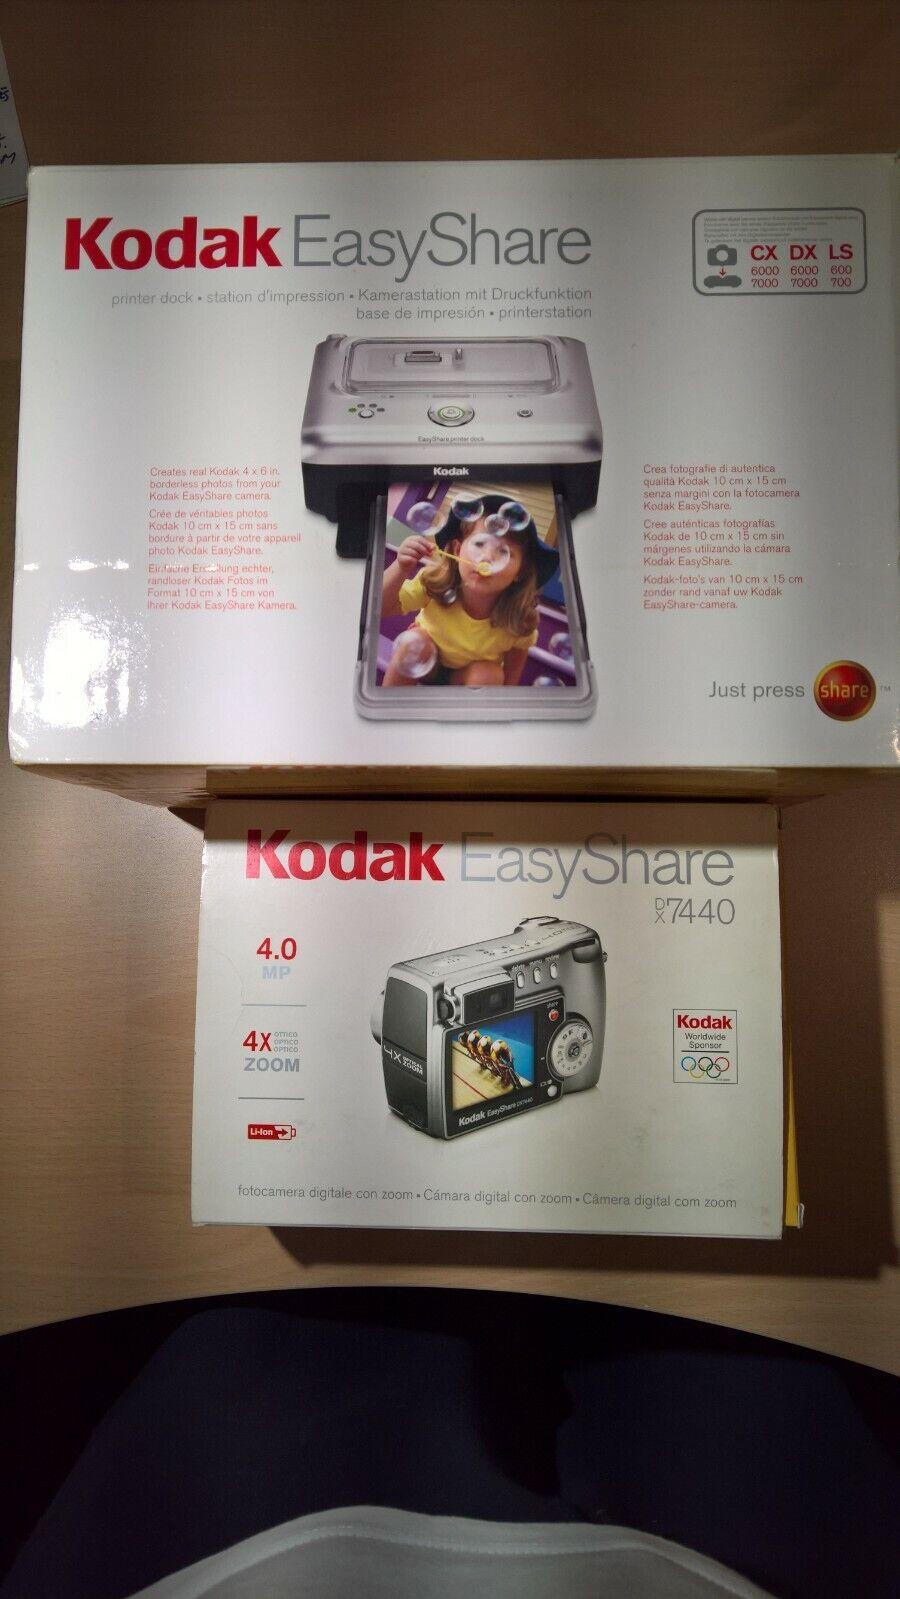 Cámara + Impresora fotográfica Kodak PictBridge impecables